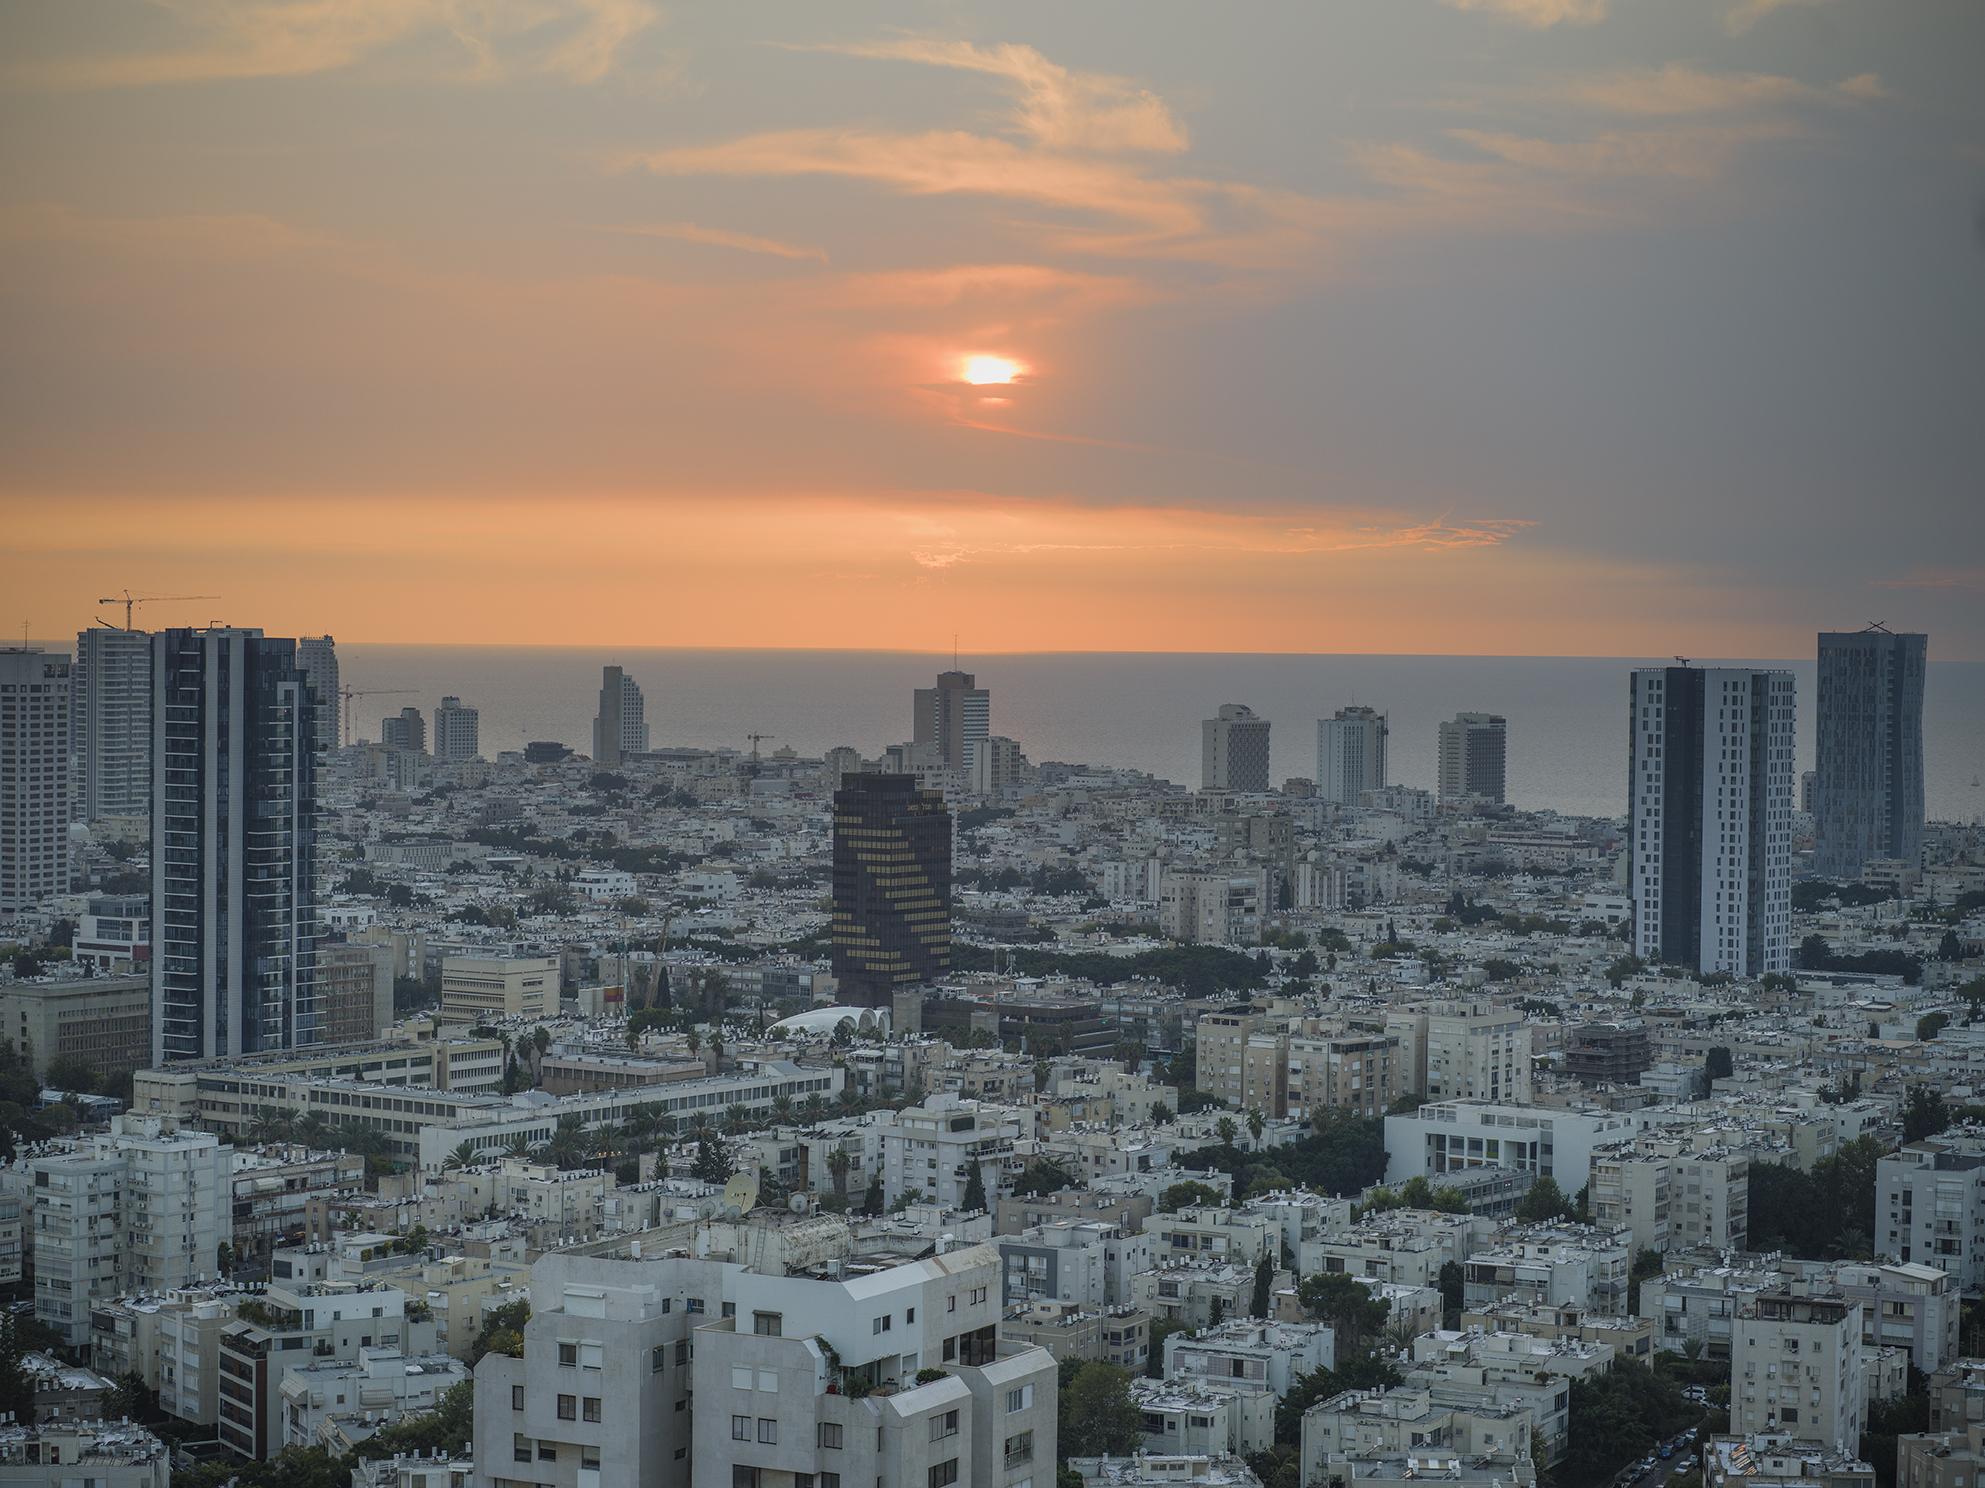 Tel-Aviv, Israel. November 2018.